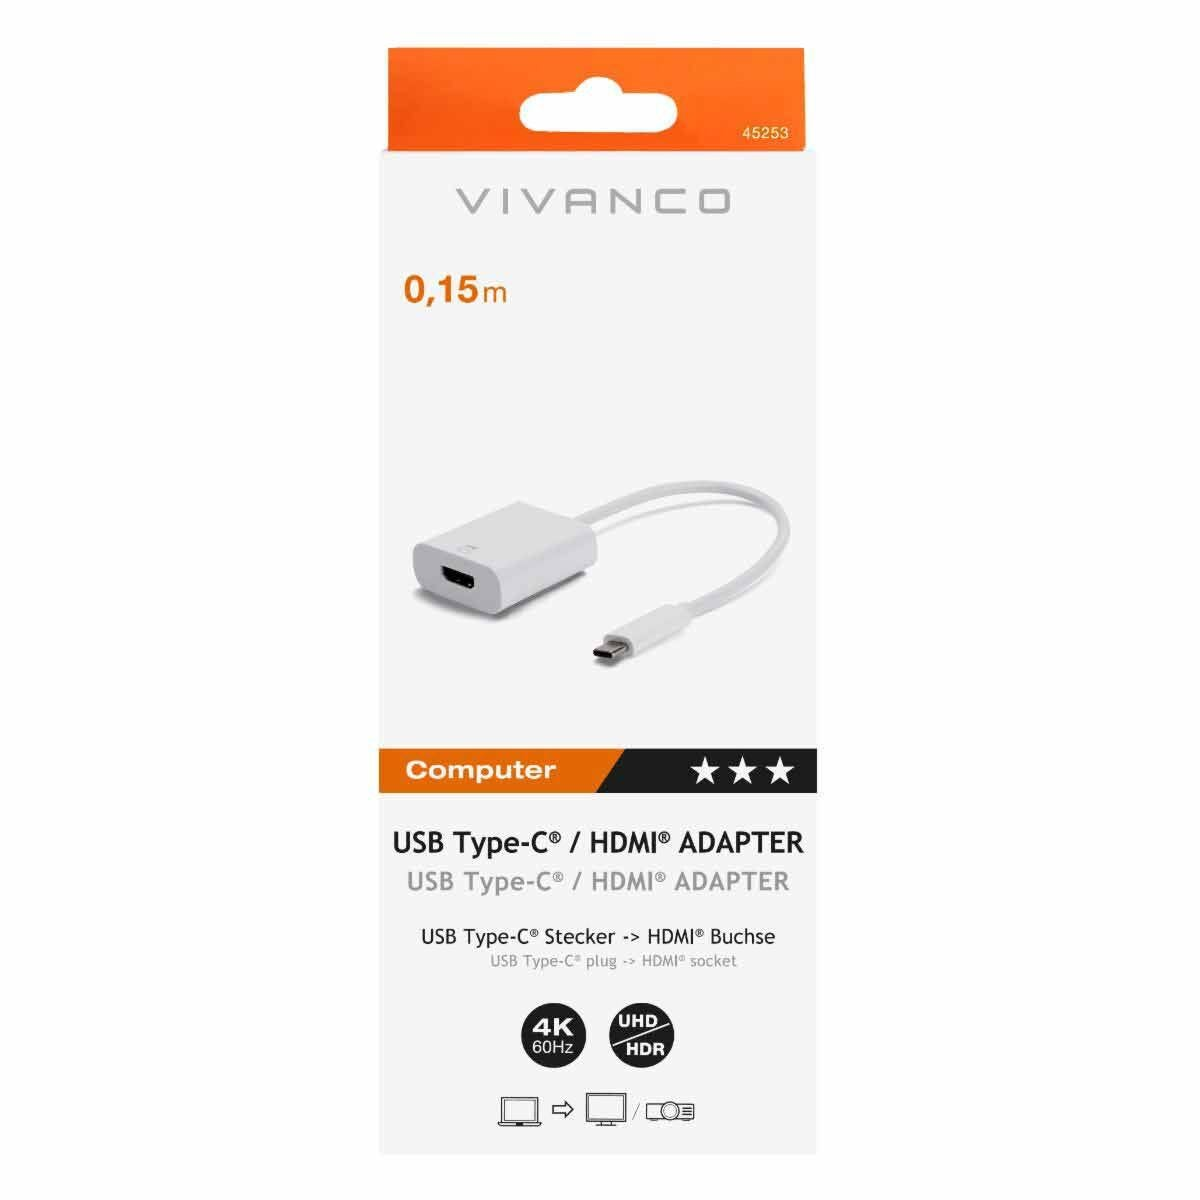 Vivanco USB-C to HDMI Adapter